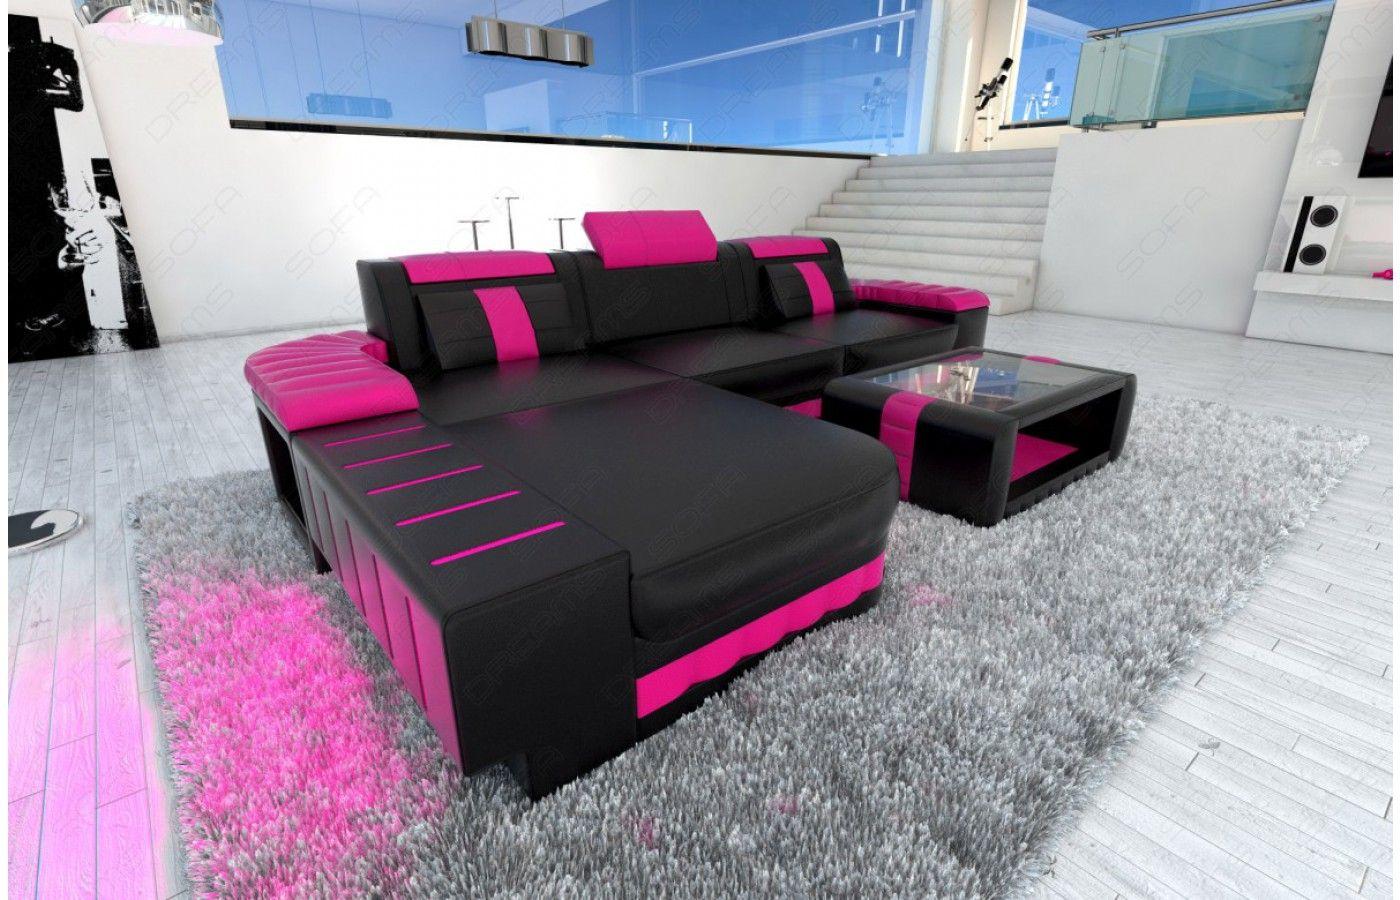 ecksofa bellagio ledersofa designersofa bellagio led l form pinterest sofa ledersofa und. Black Bedroom Furniture Sets. Home Design Ideas